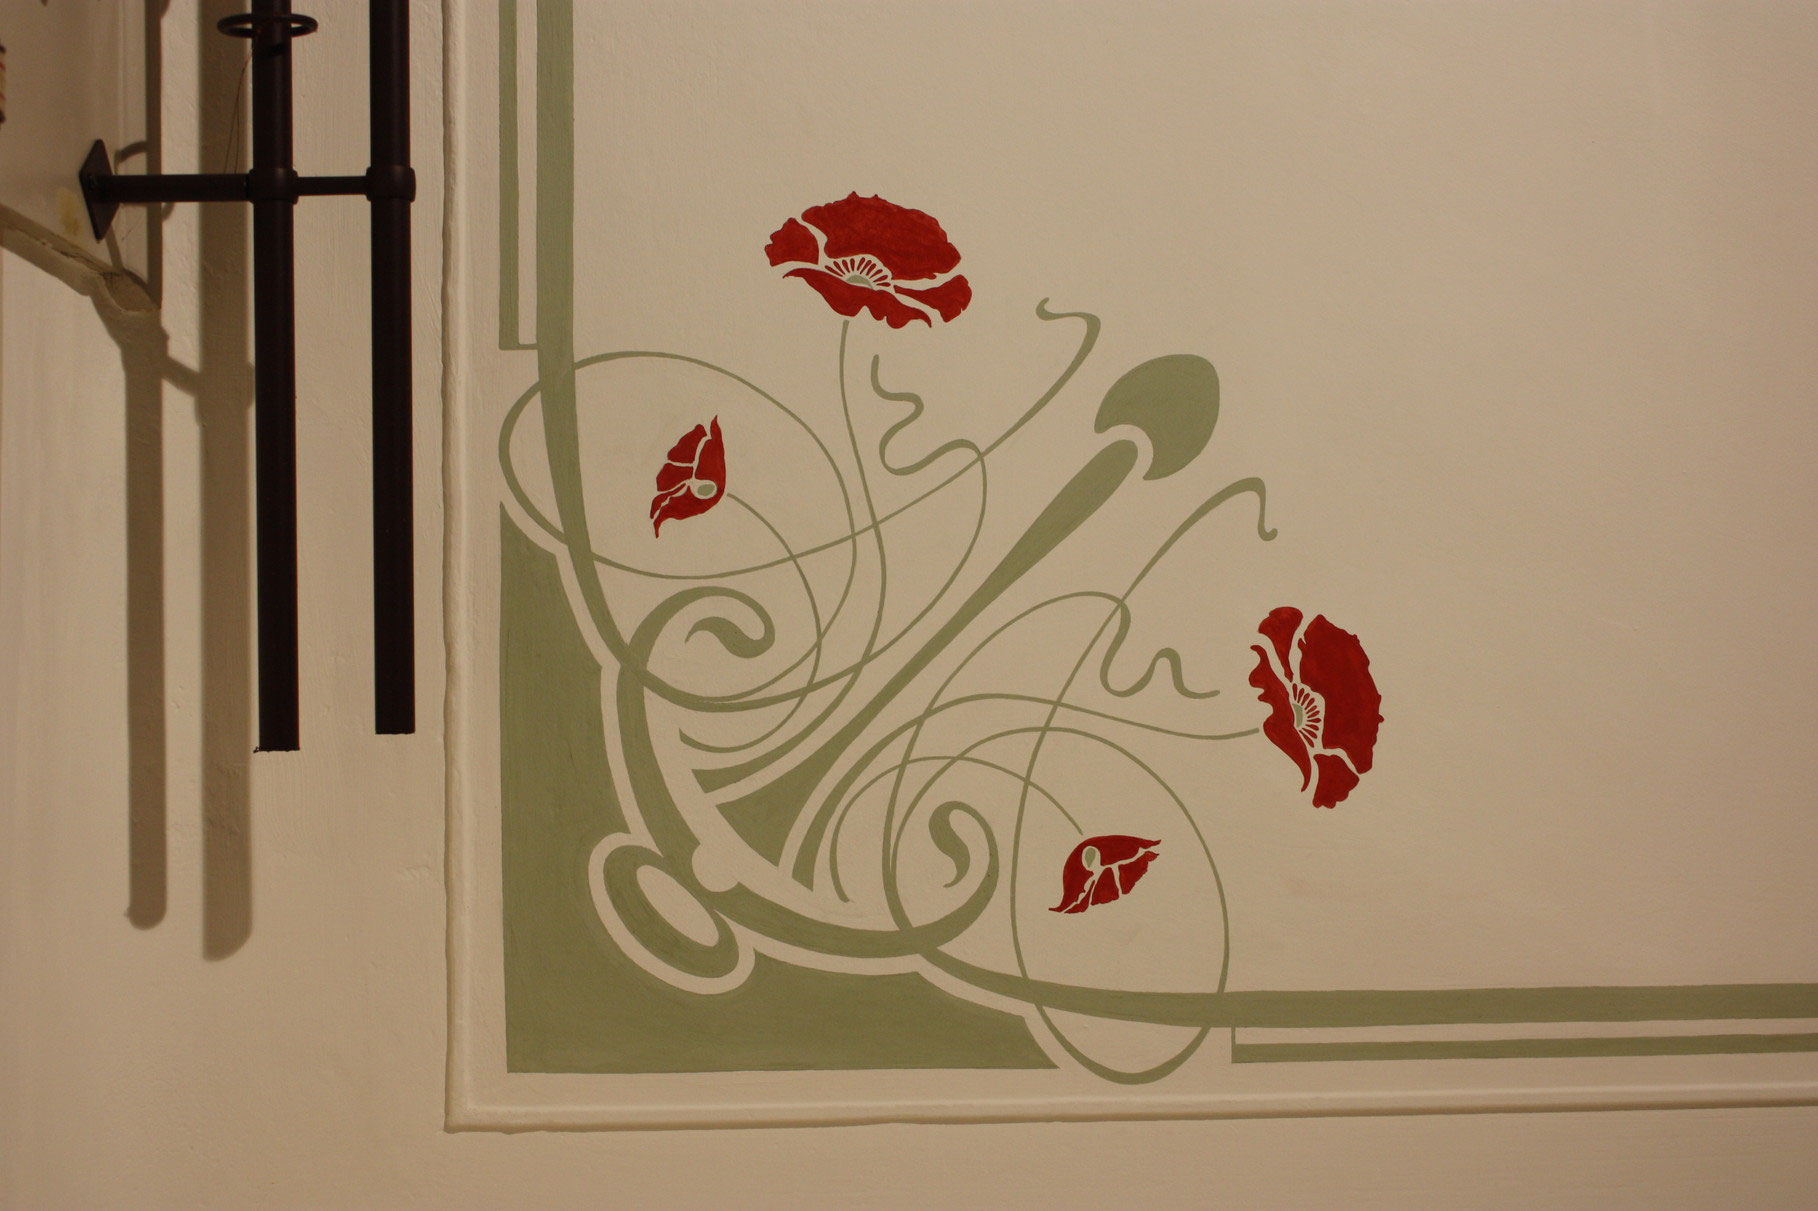 deckenmalerei gew lbemalerei deckengem lde guttermann illusionsmalerei fassadenmalerei. Black Bedroom Furniture Sets. Home Design Ideas